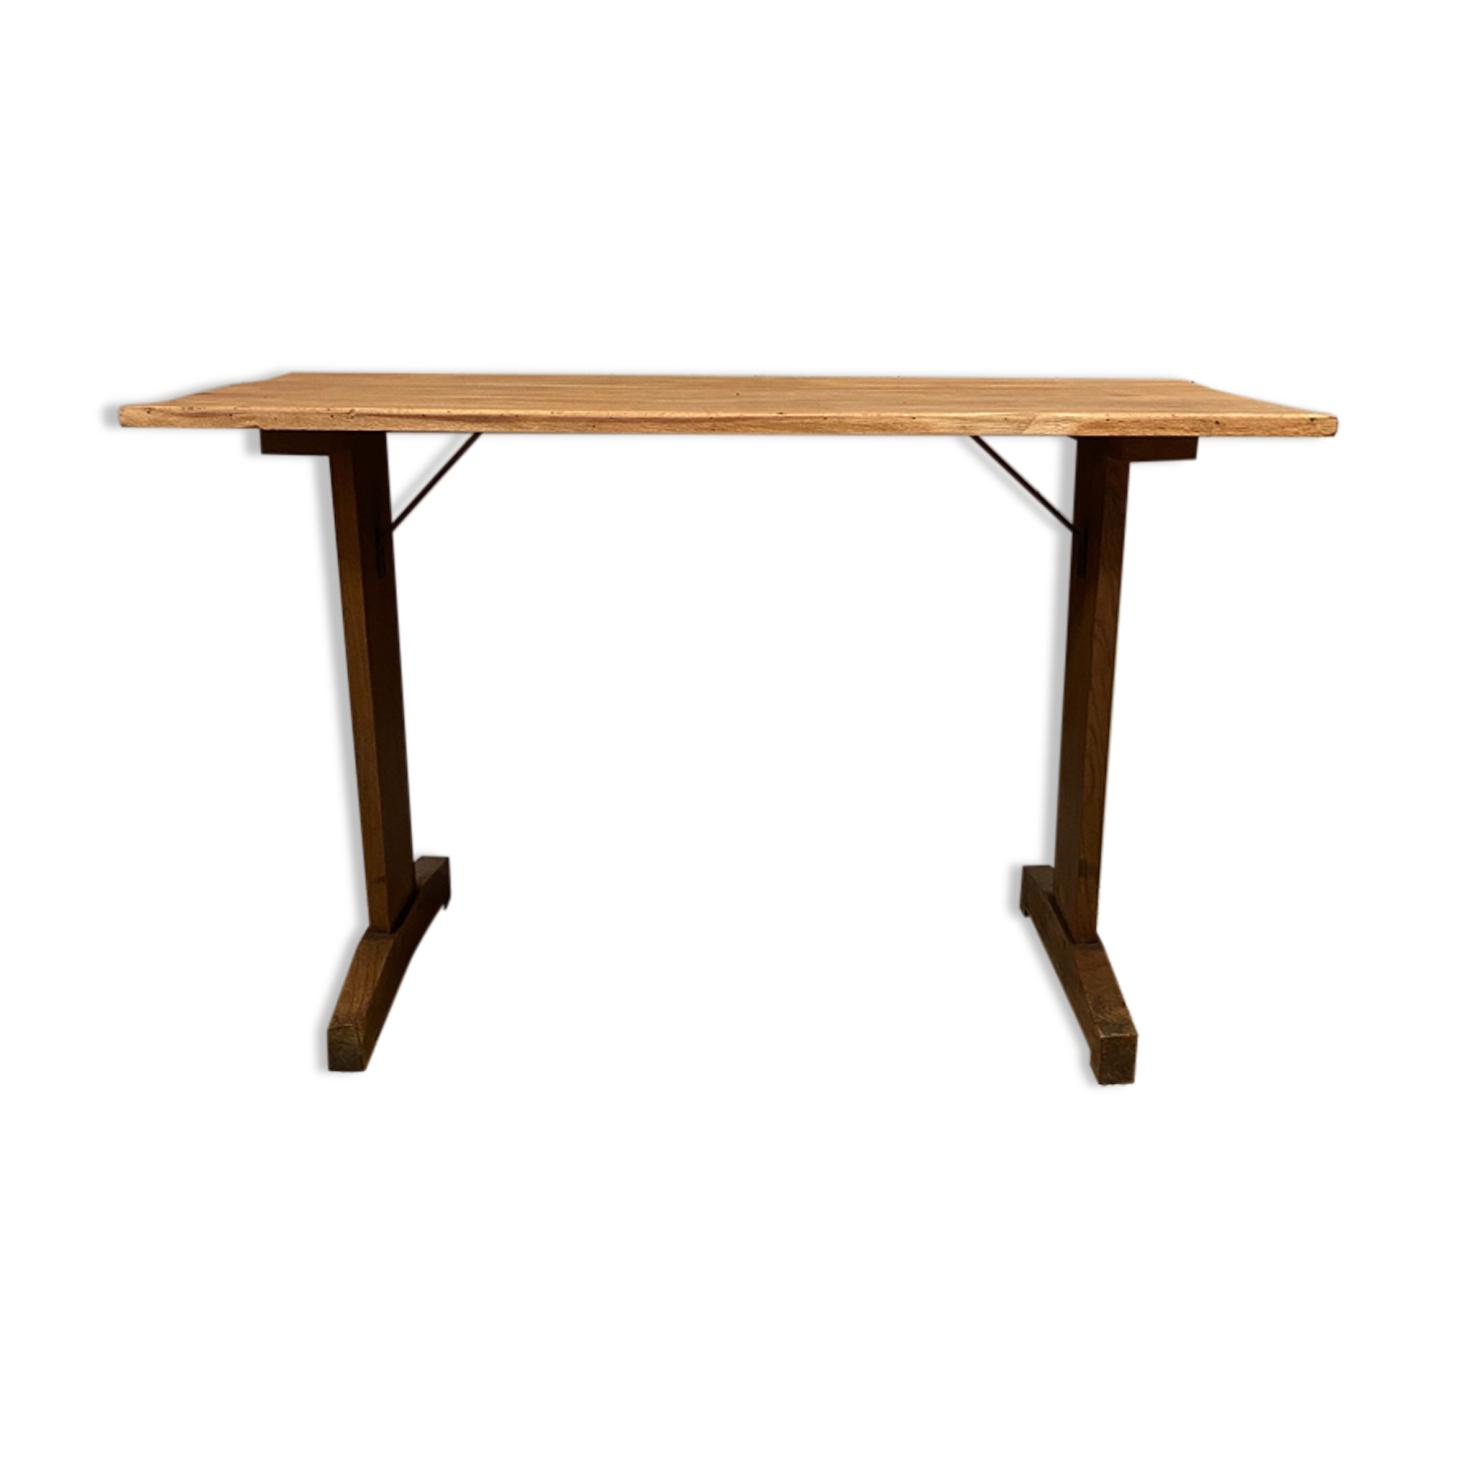 Table bistrot des années 40 en chêne